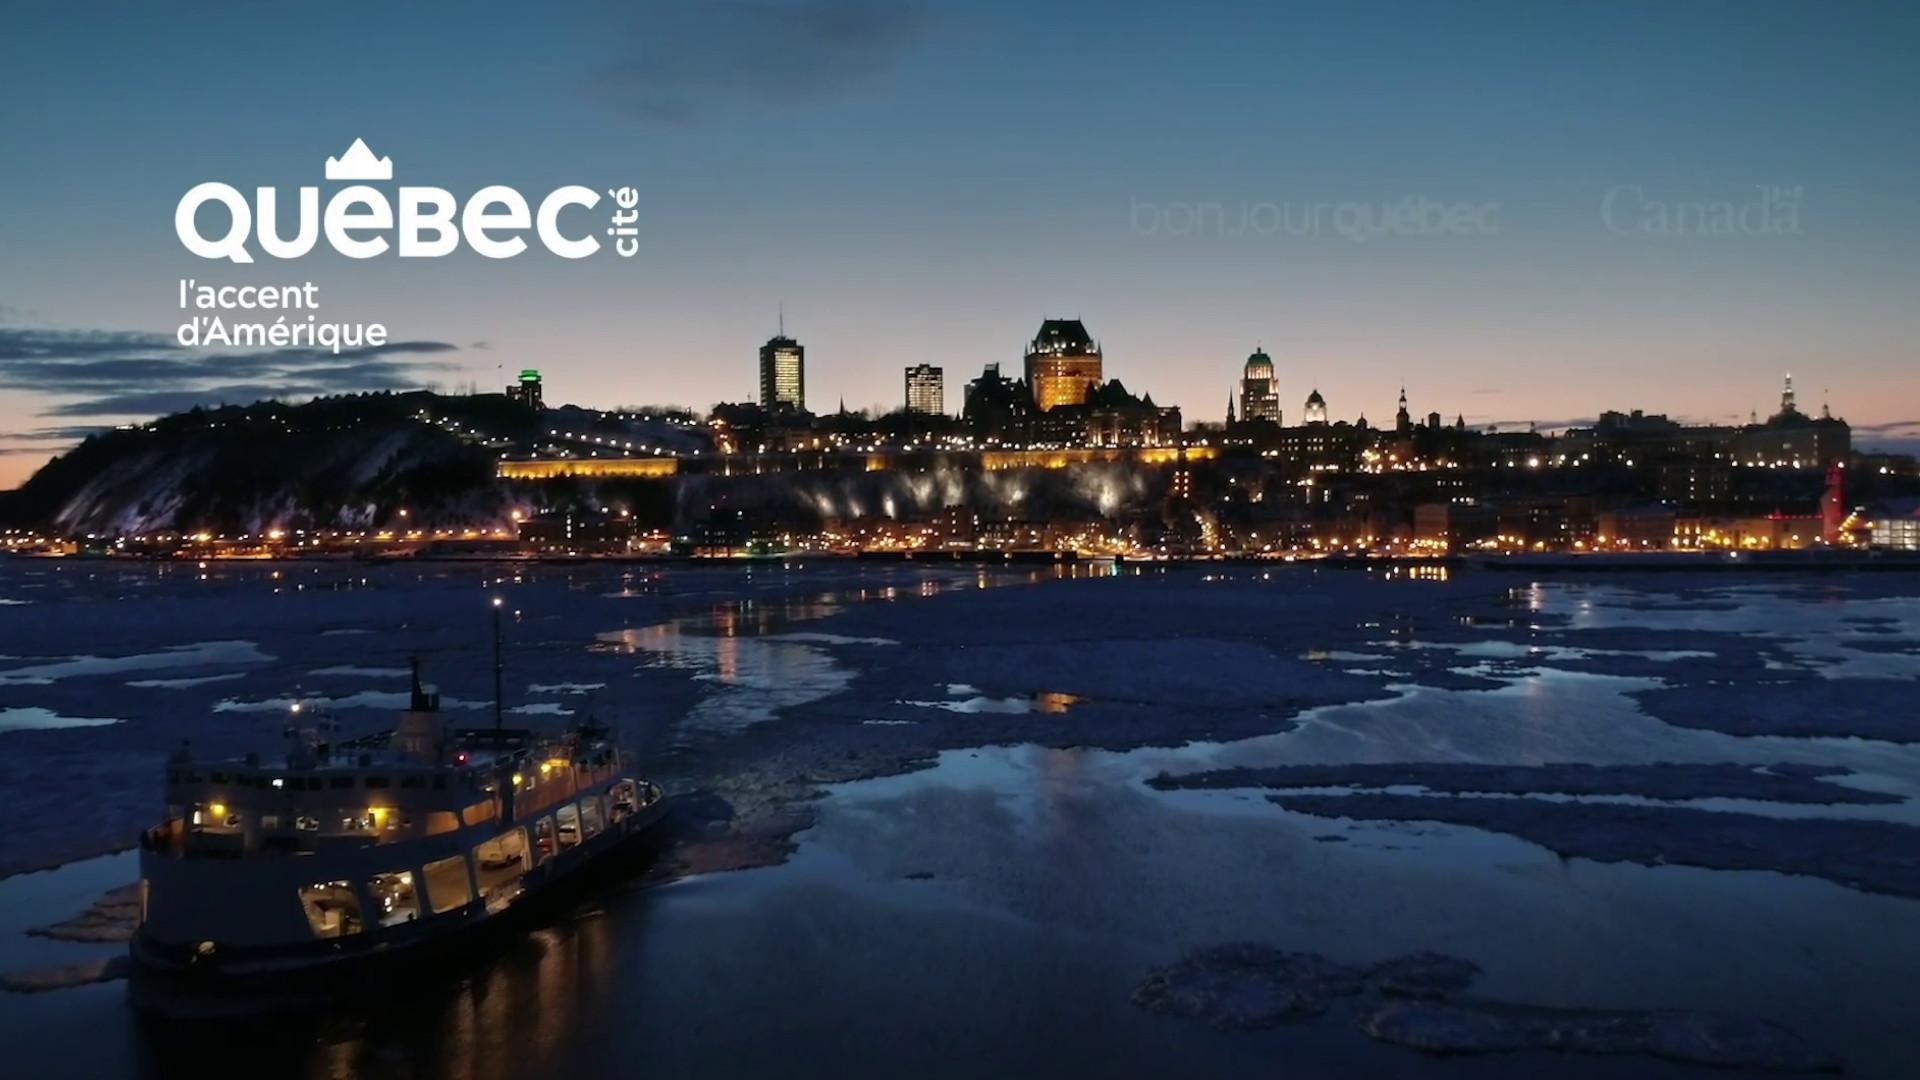 Visit Us Later Campaign by Quebec City Tourism